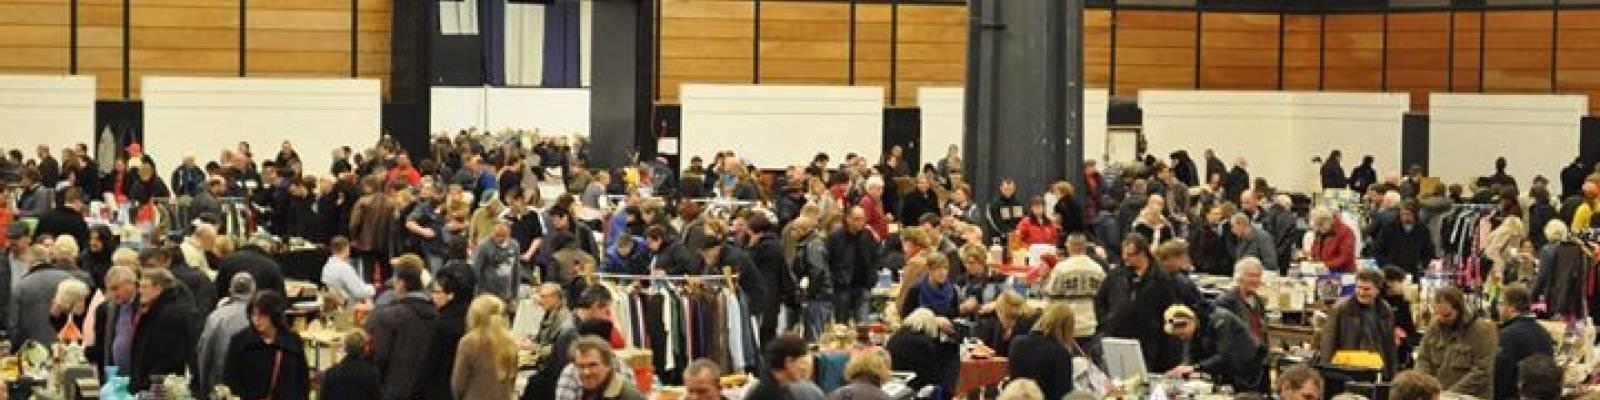 Groningen - Martiniplaza - Stadjersmarkt